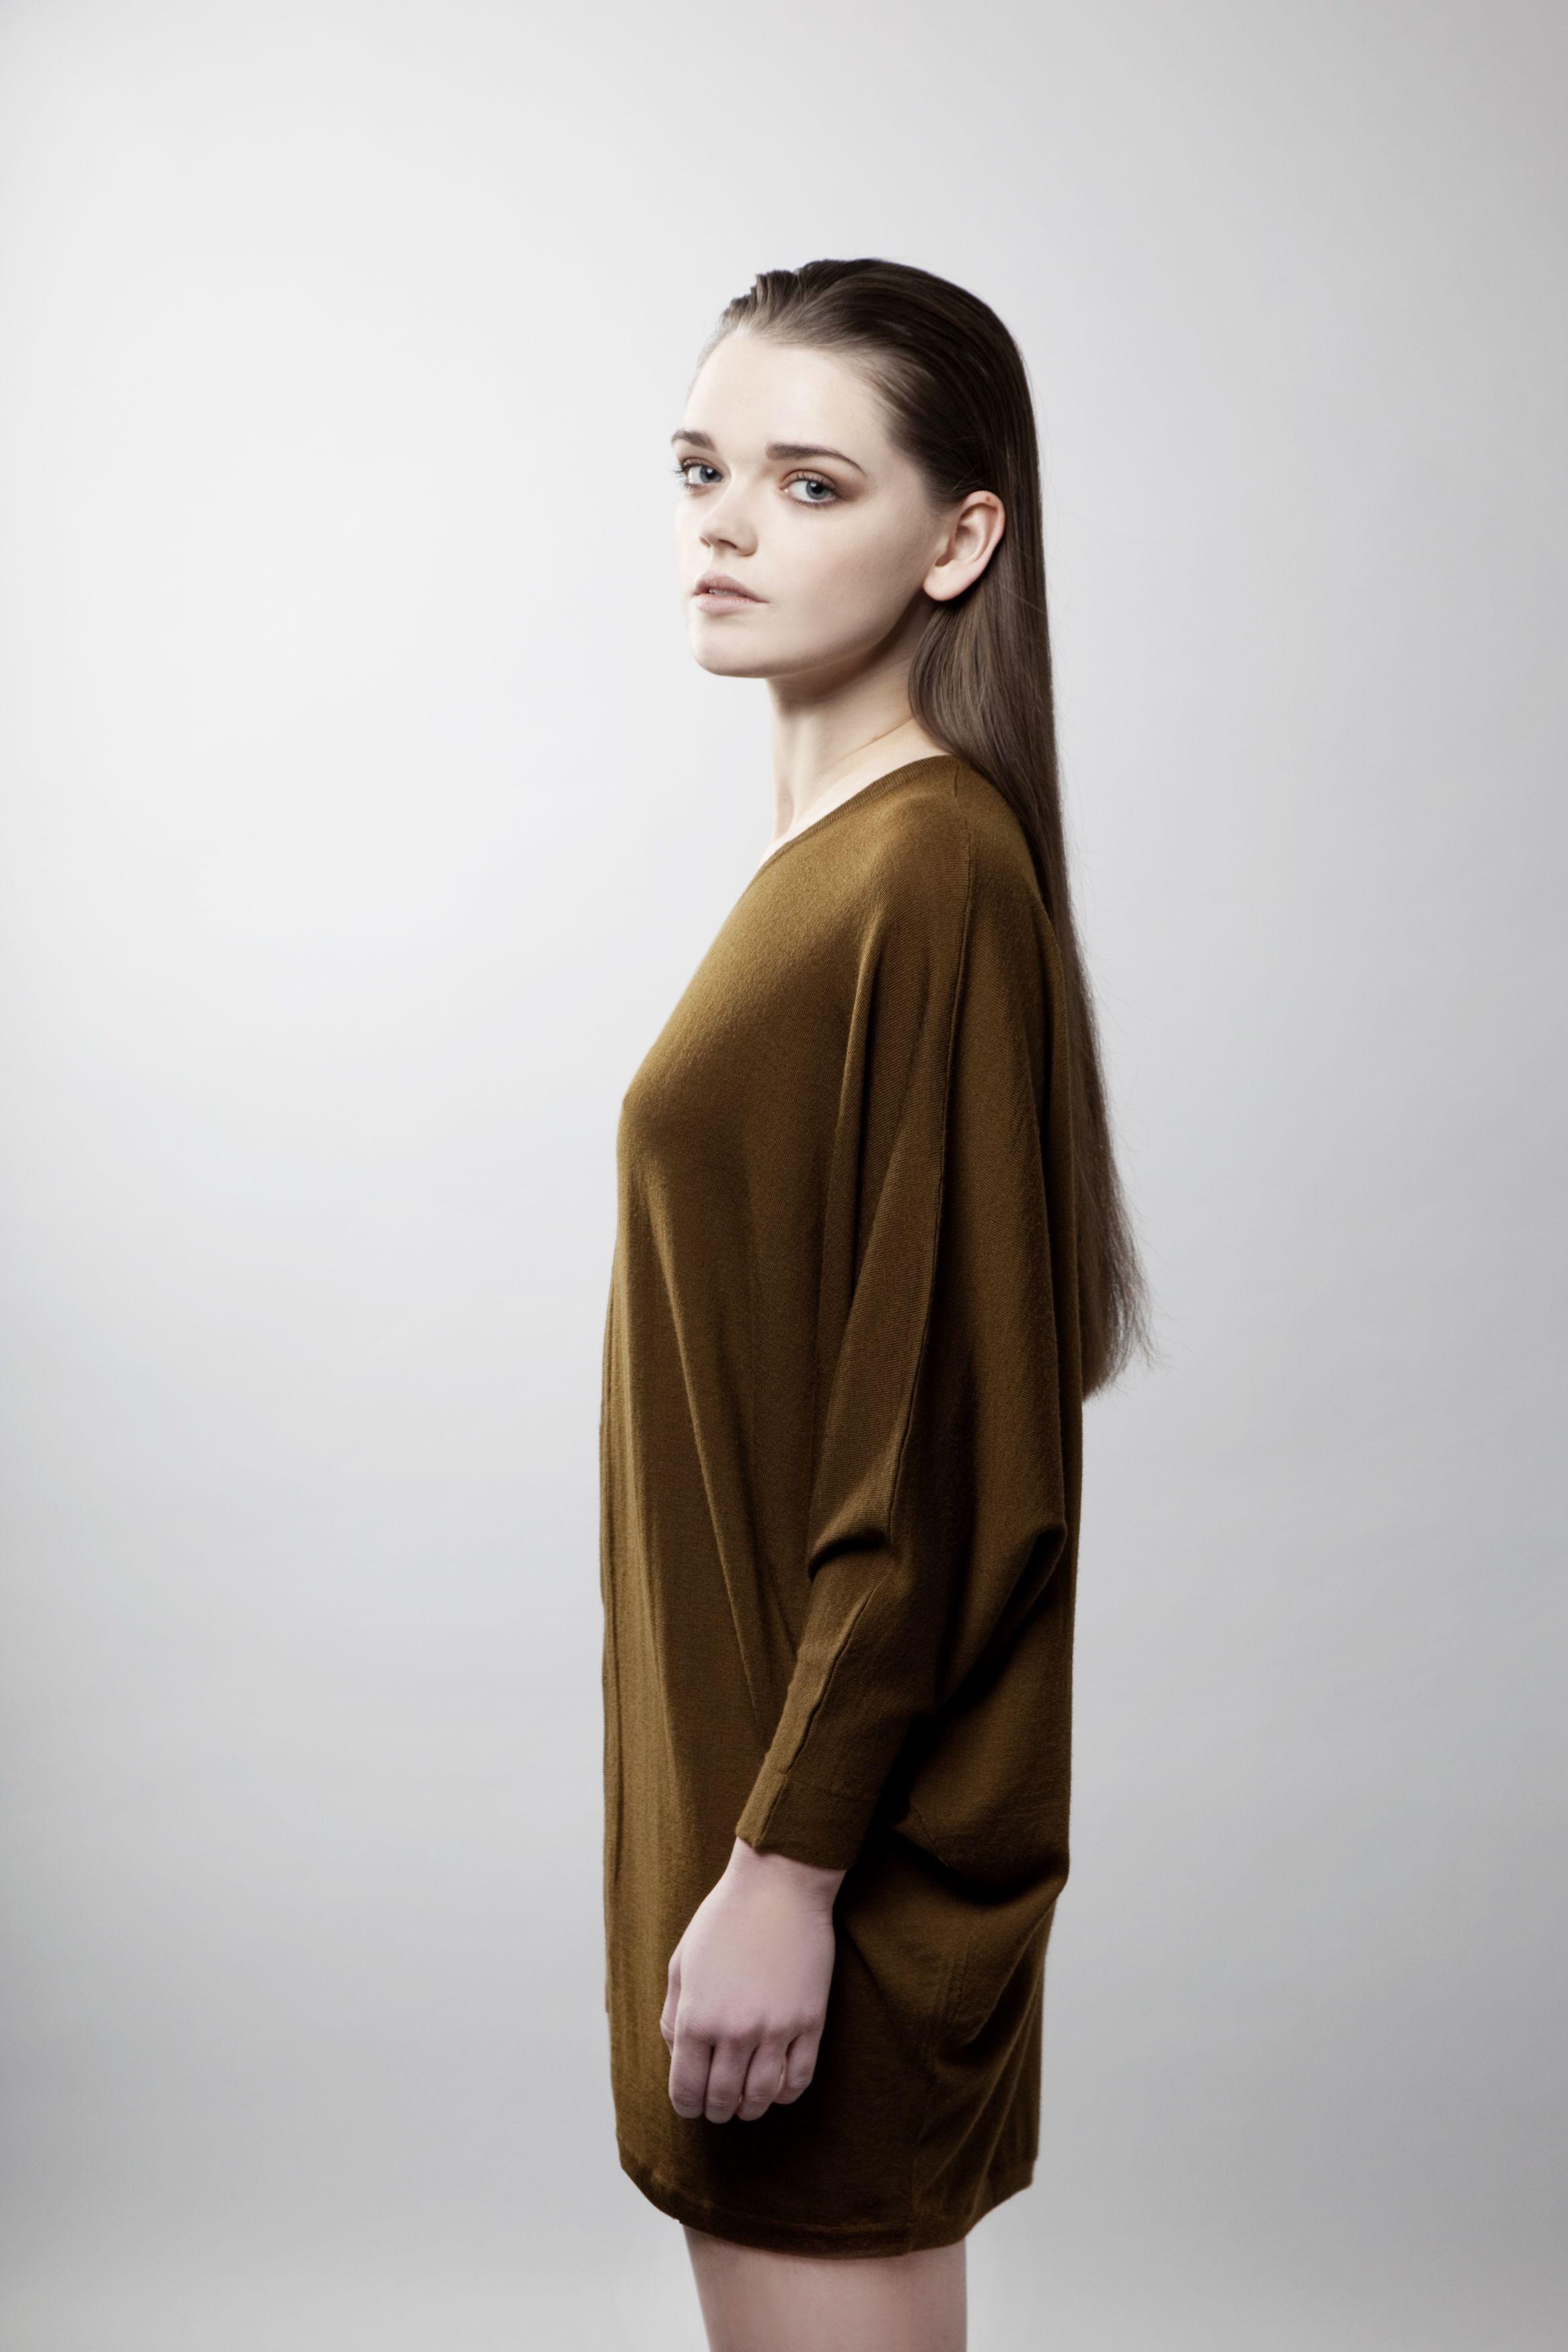 MASKA Karin long cardigan | 100% extra fine Merino wool | Knitted in Nepal